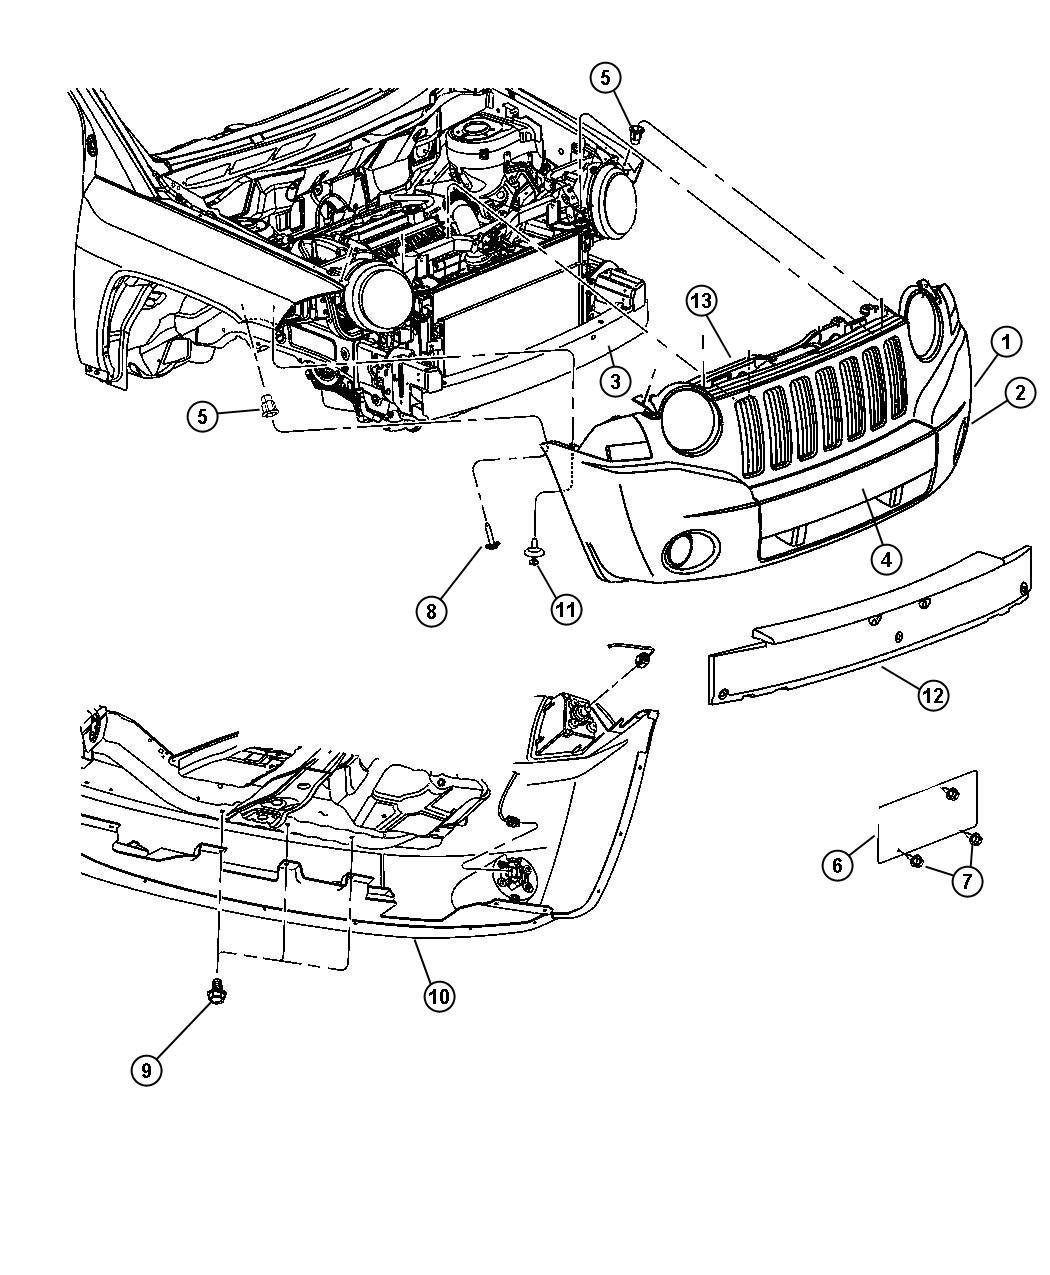 Jeep Compass Reinforcement Front Bumper